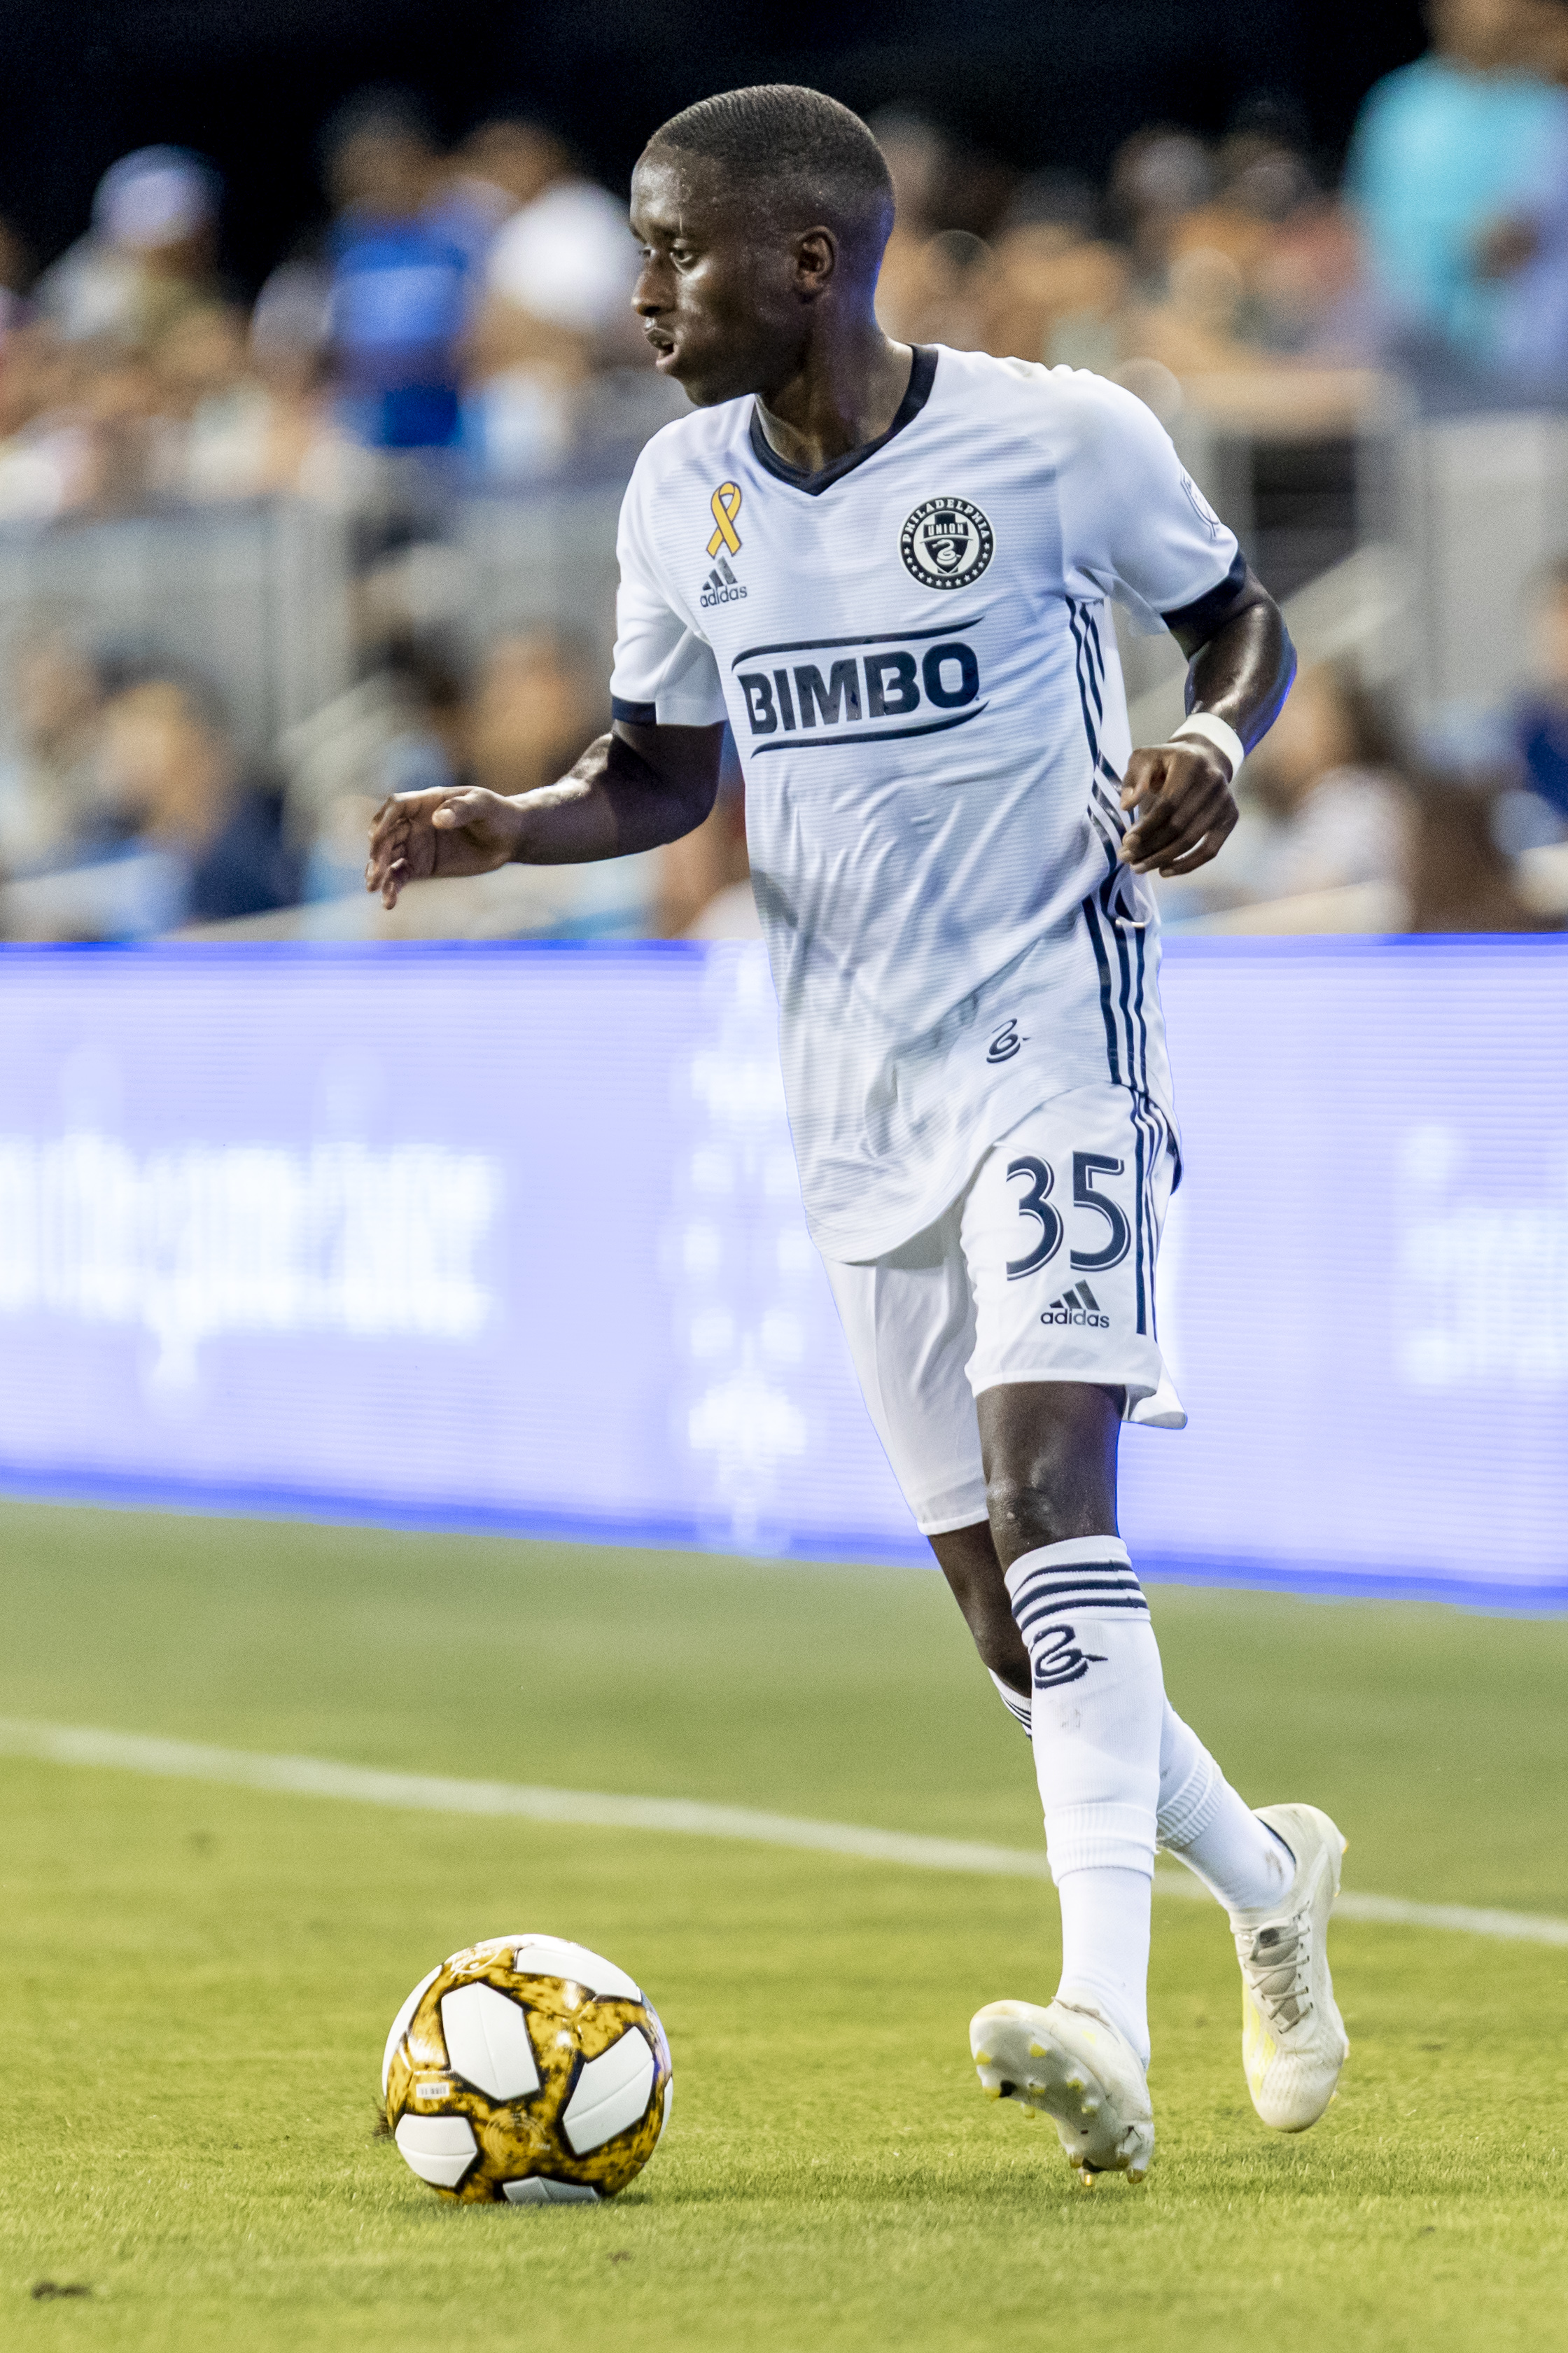 SOCCER: SEP 25 MLS - Philadelphia Union at San Jose Earthquakes